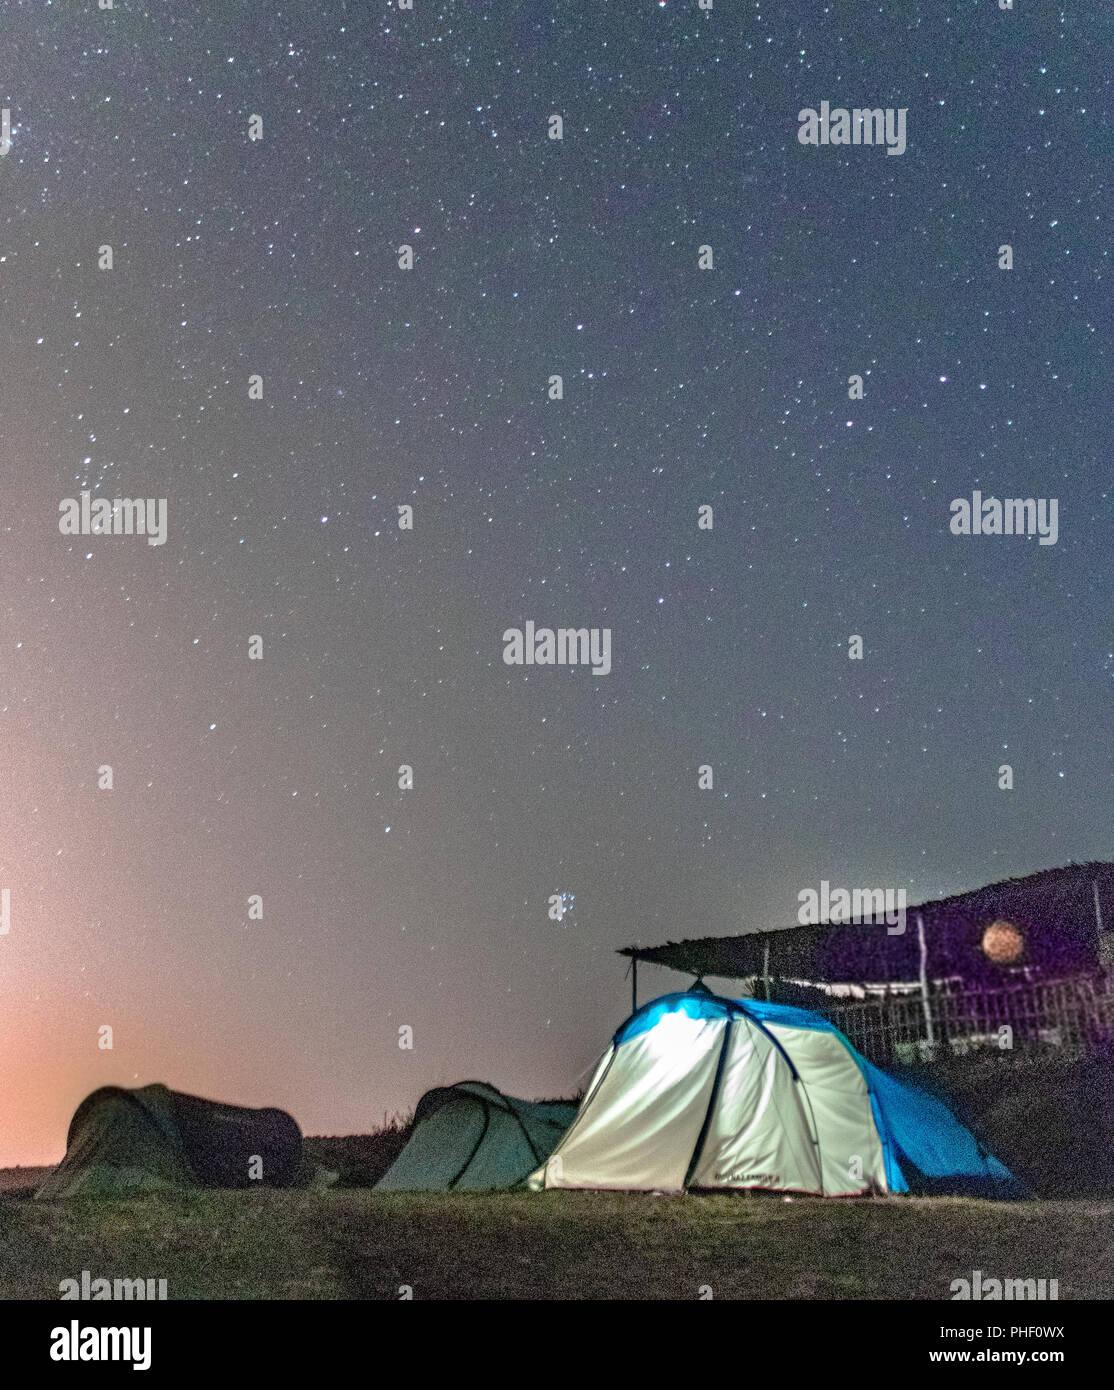 L'astrophotographie Mrissat camp Photo Stock